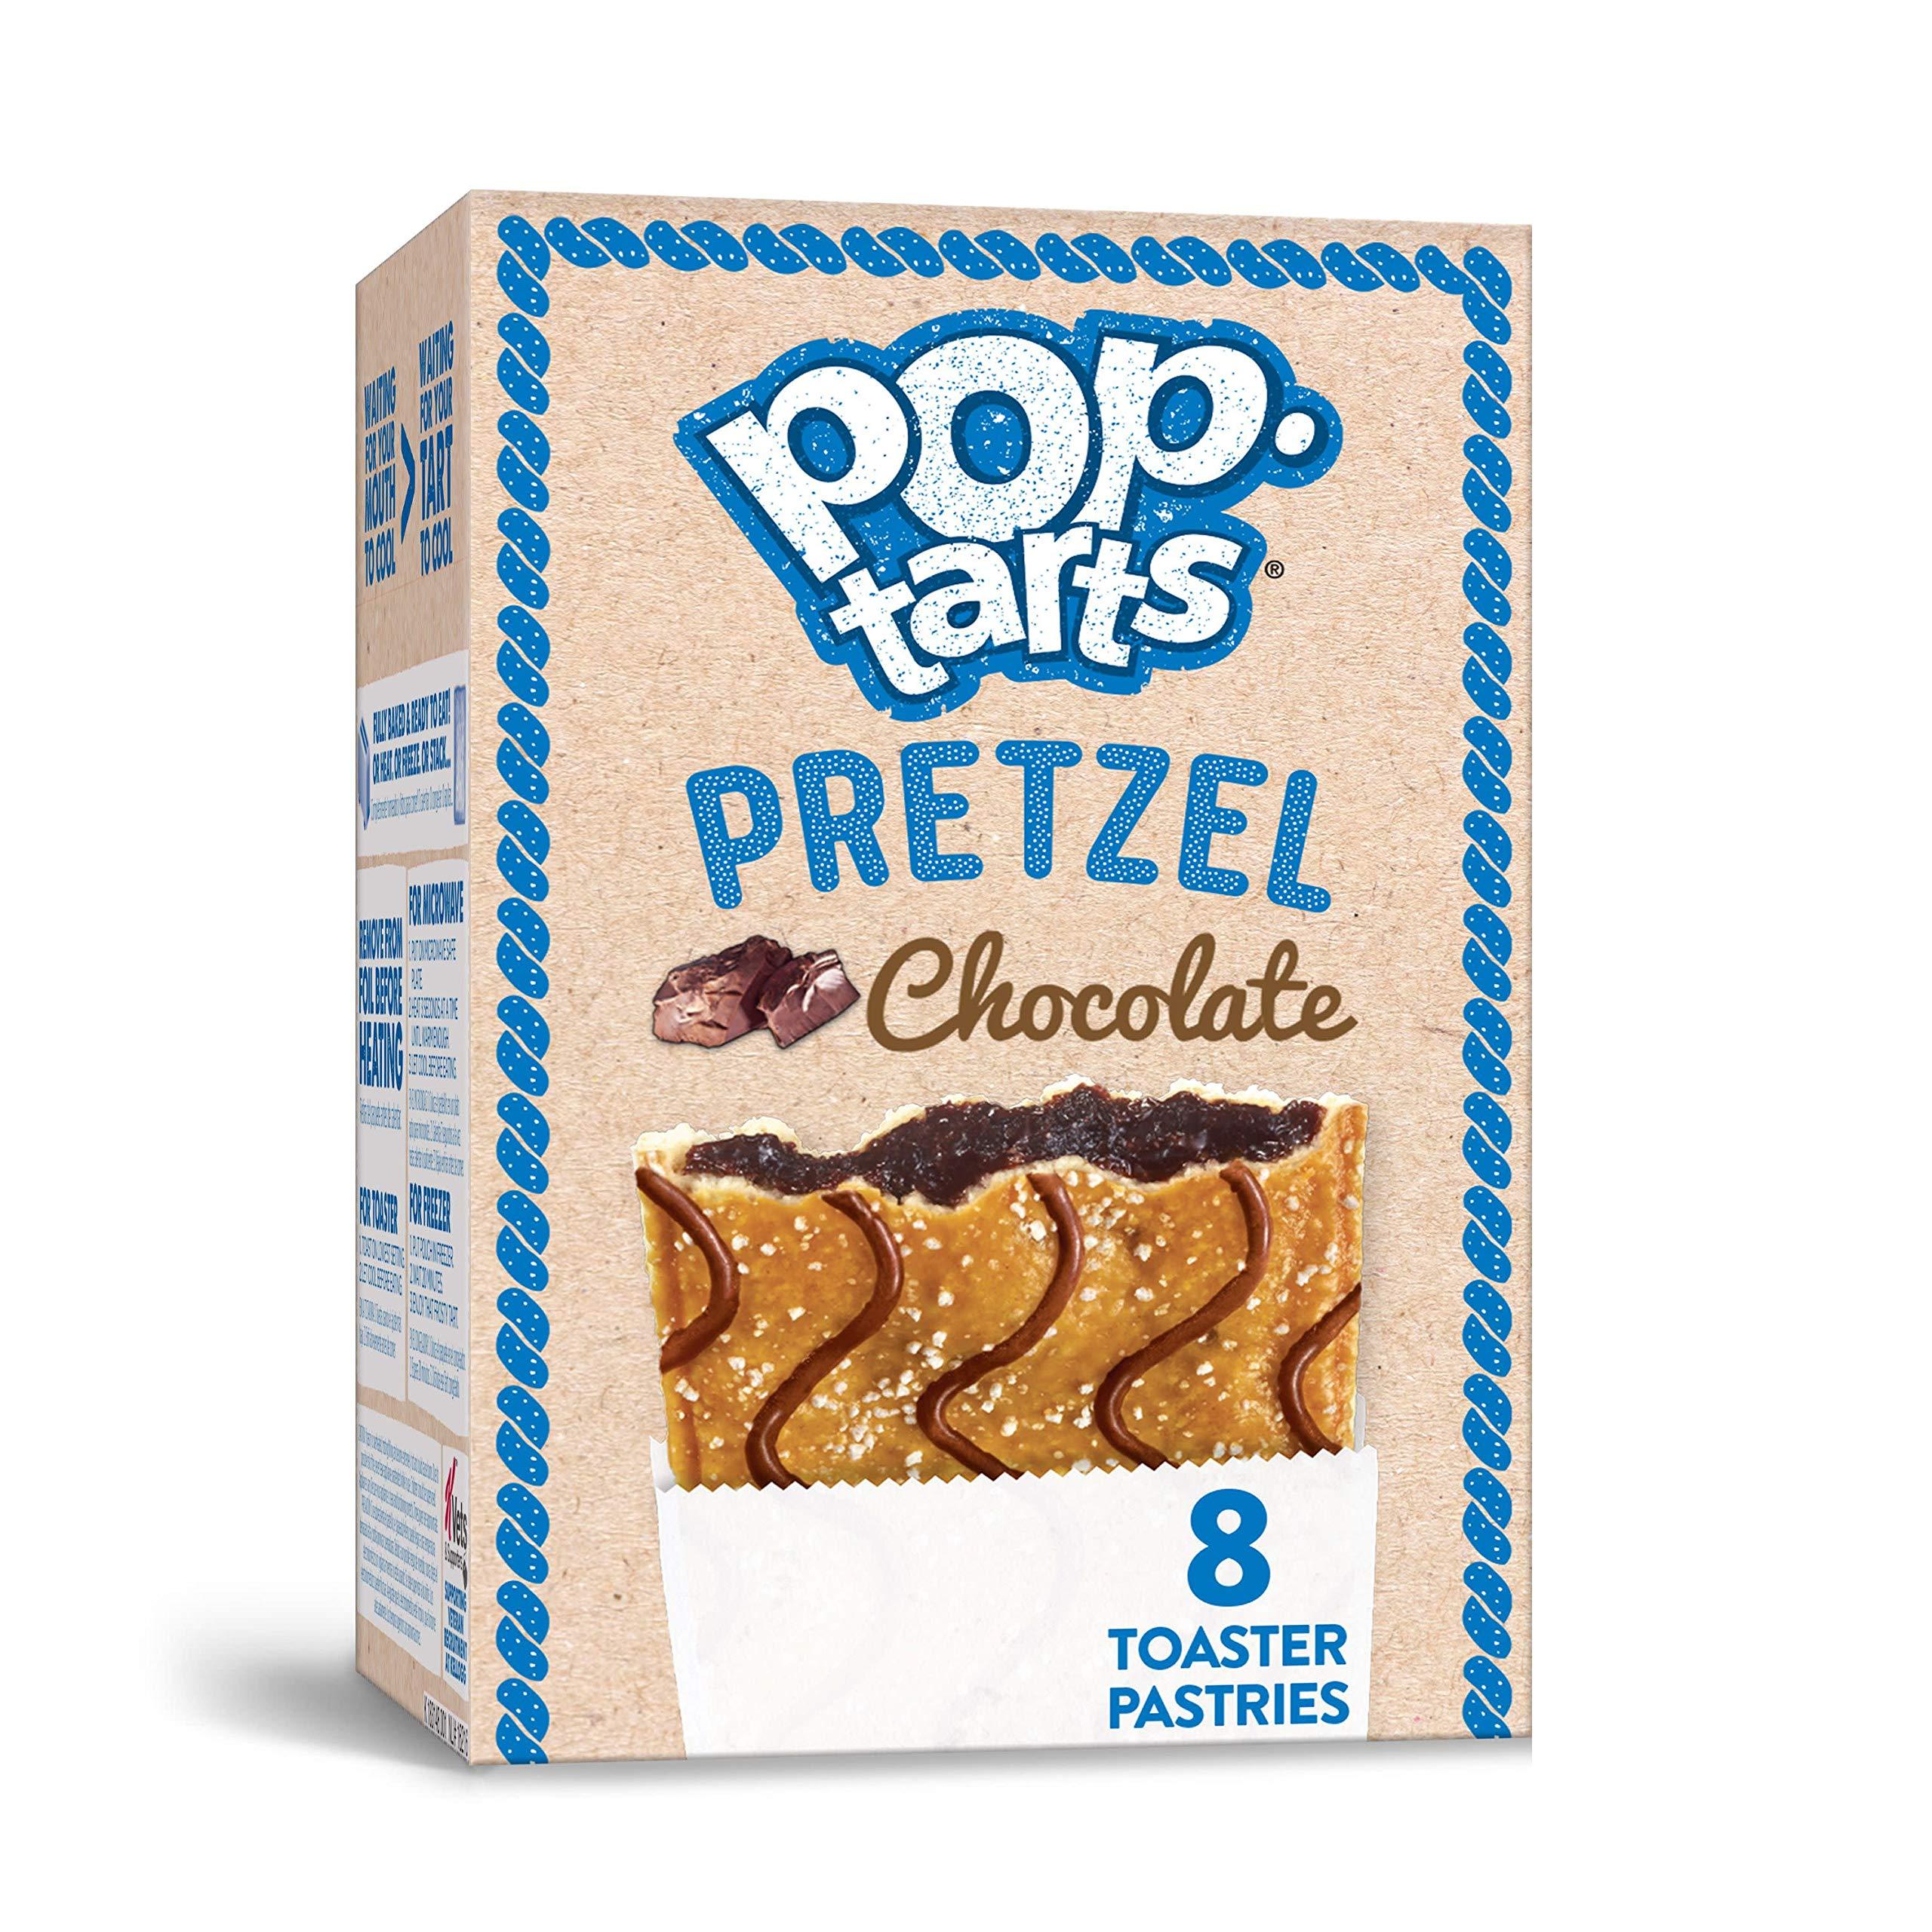 Pop-Tarts Pretzel, Breakfast Toaster Pastries, Chocolate, 13.5oz Box (8 Count)